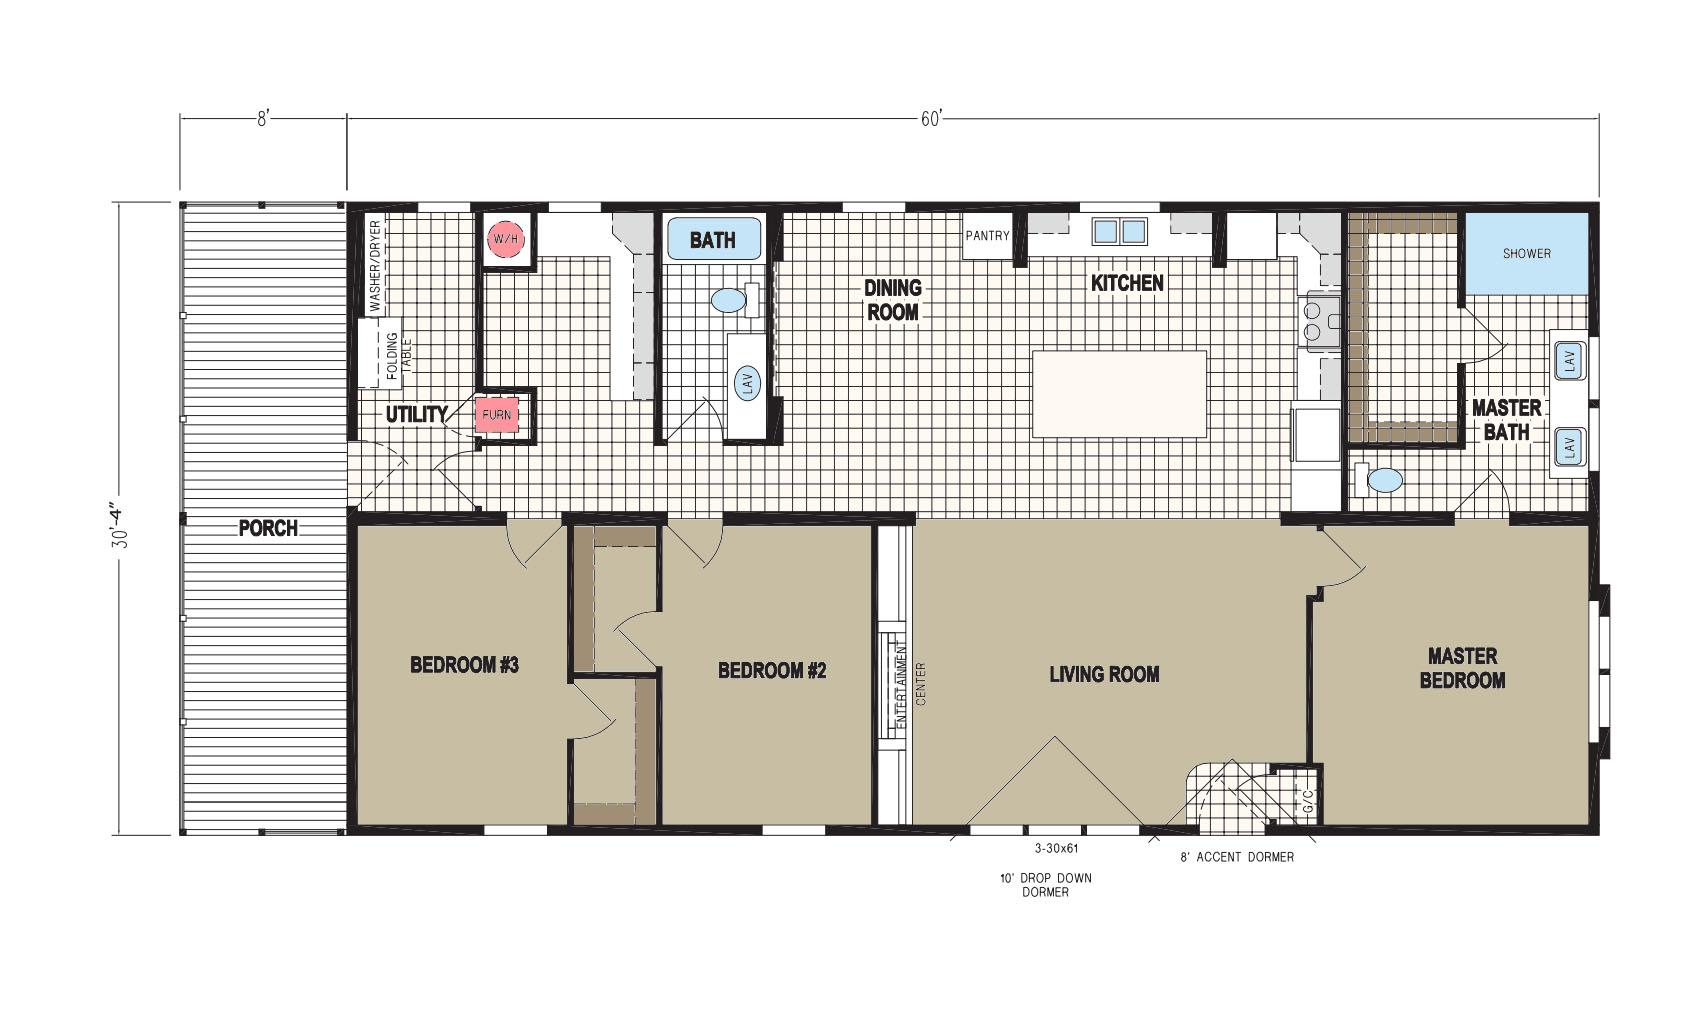 floorplan image for unit 323